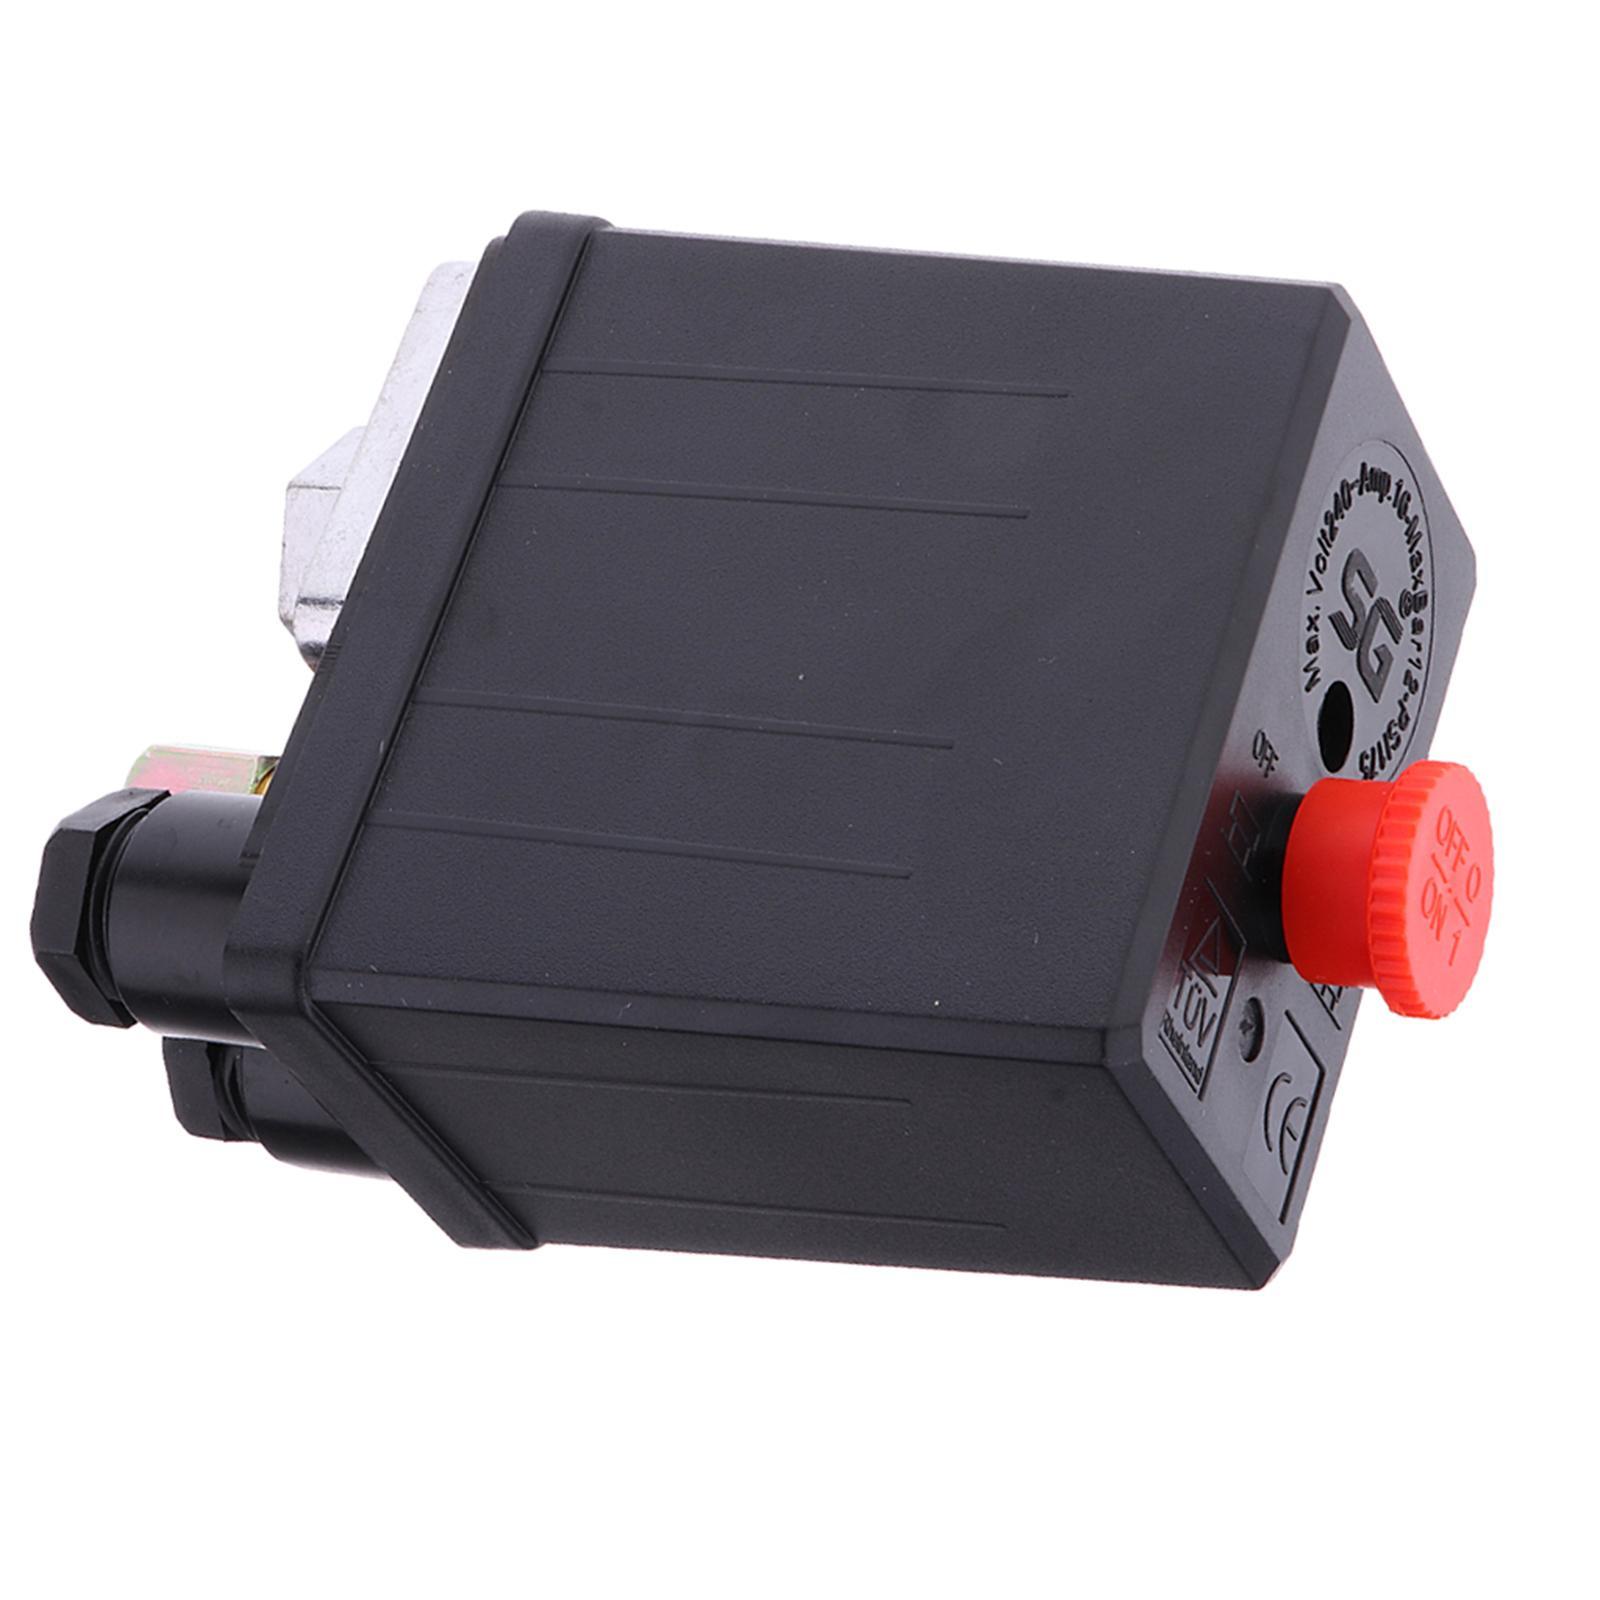 Uniporous Air Compressor Pressure Switch Control Valve 175PSI 240V